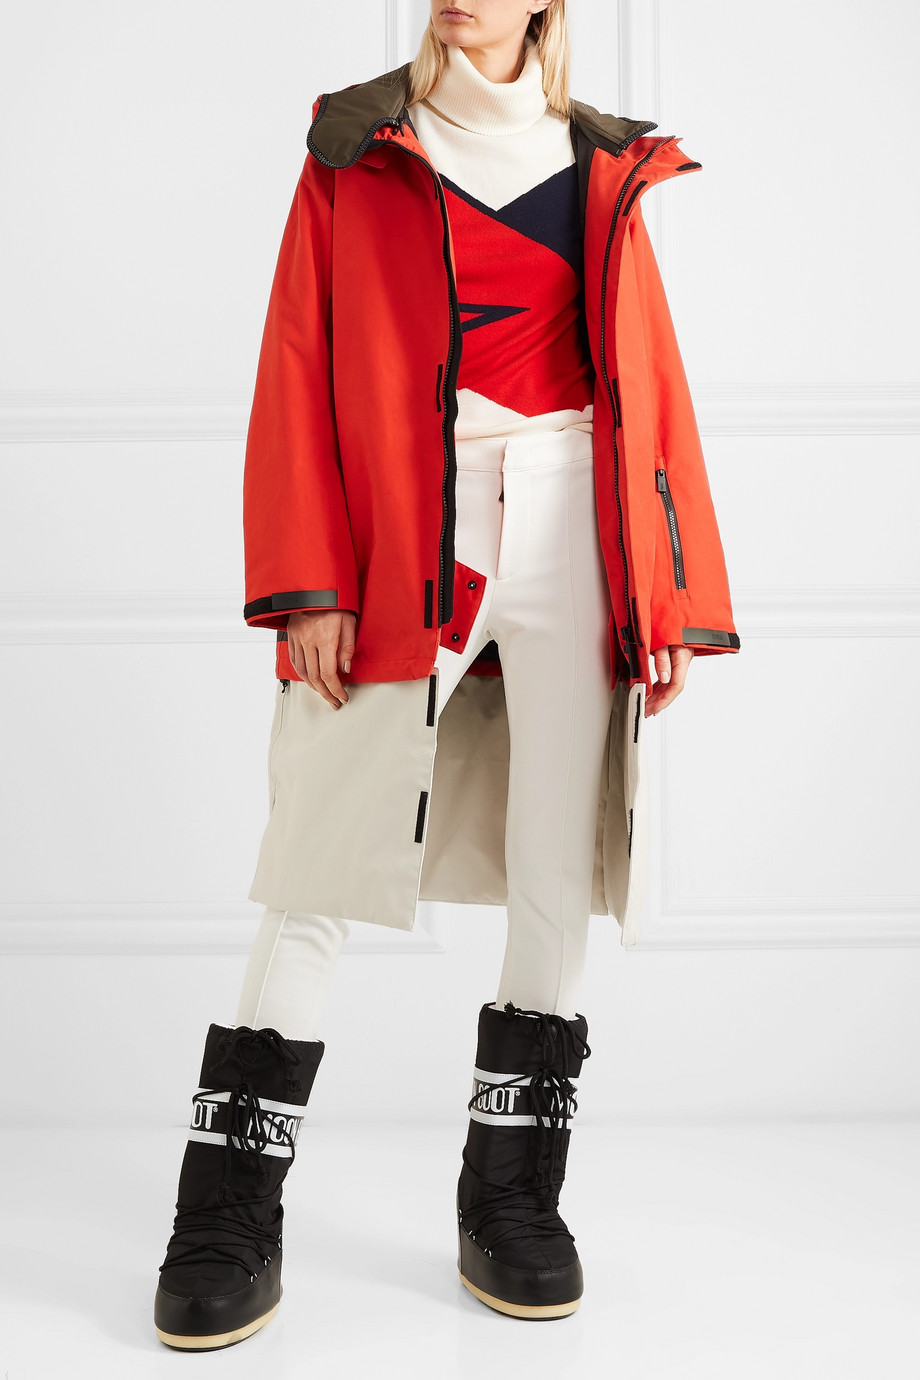 TEMPLA 3L Tombra convertible hooded cotton-blend ski coat